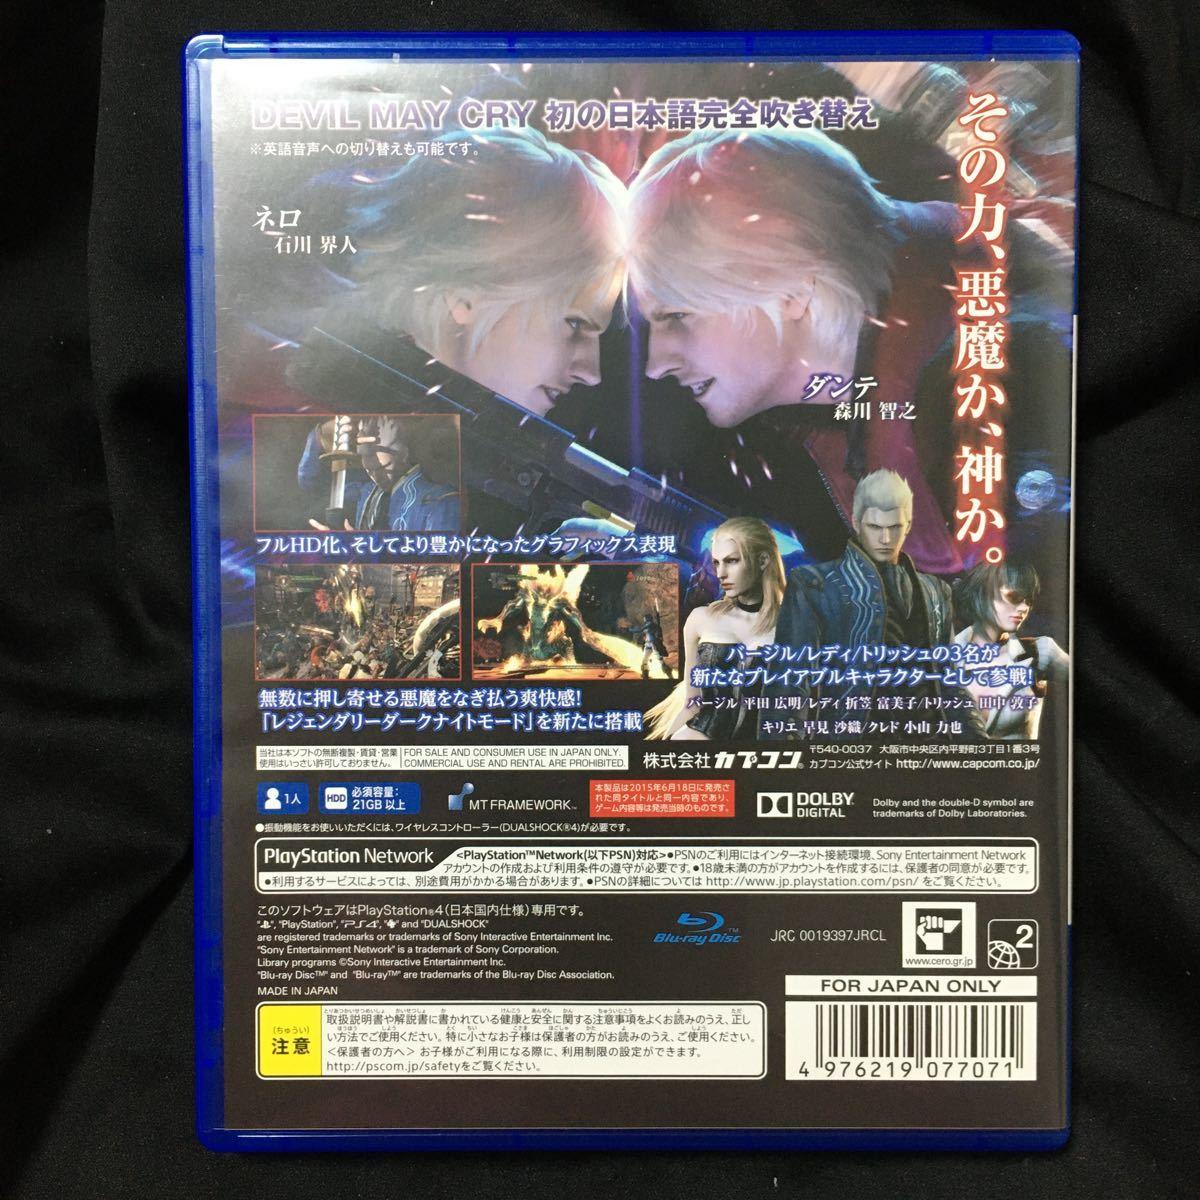 【PS4】 デビル メイ クライ 4 スペシャルエディション [Best Price]送料無料、匿名配送、当日発送可能♪